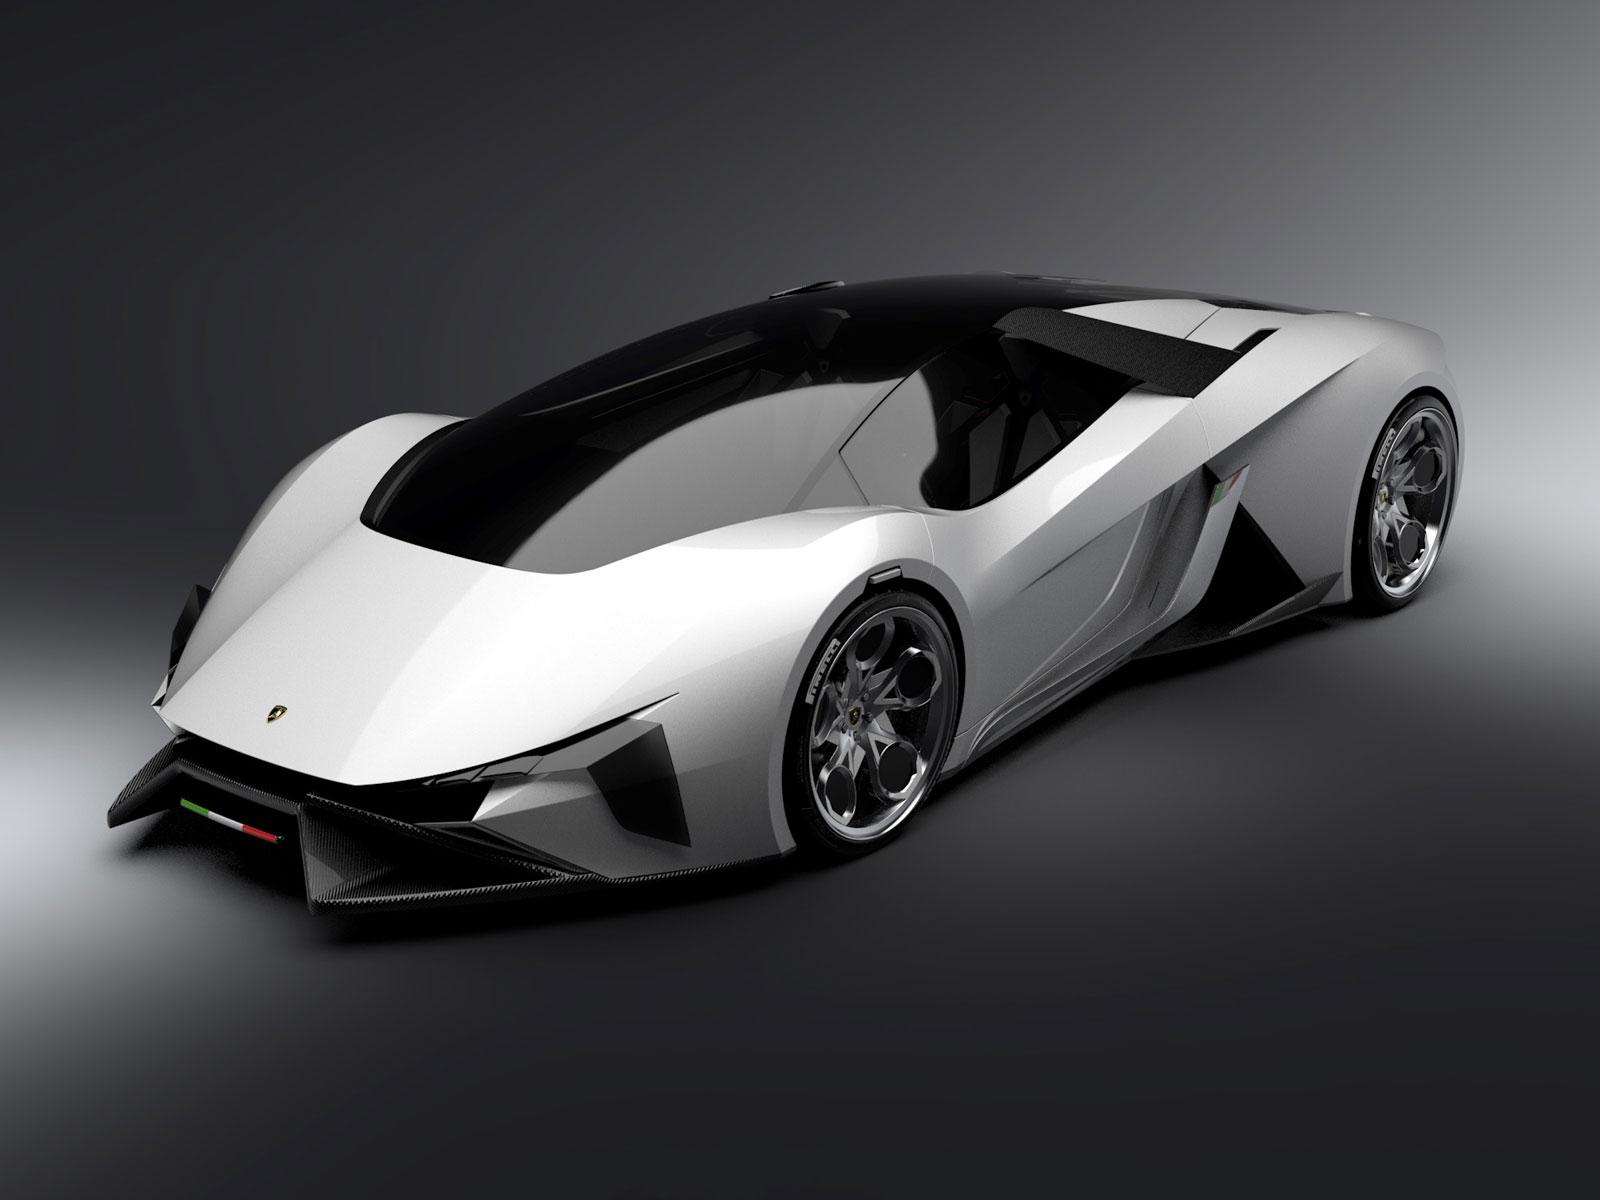 http://2.bp.blogspot.com/-BPM7WsKzdmg/UiuvZ0te-xI/AAAAAAAApE4/Ihdrmr8G8-Q/s1600/2013+Lamborghini+Diamante+Concept.jpg